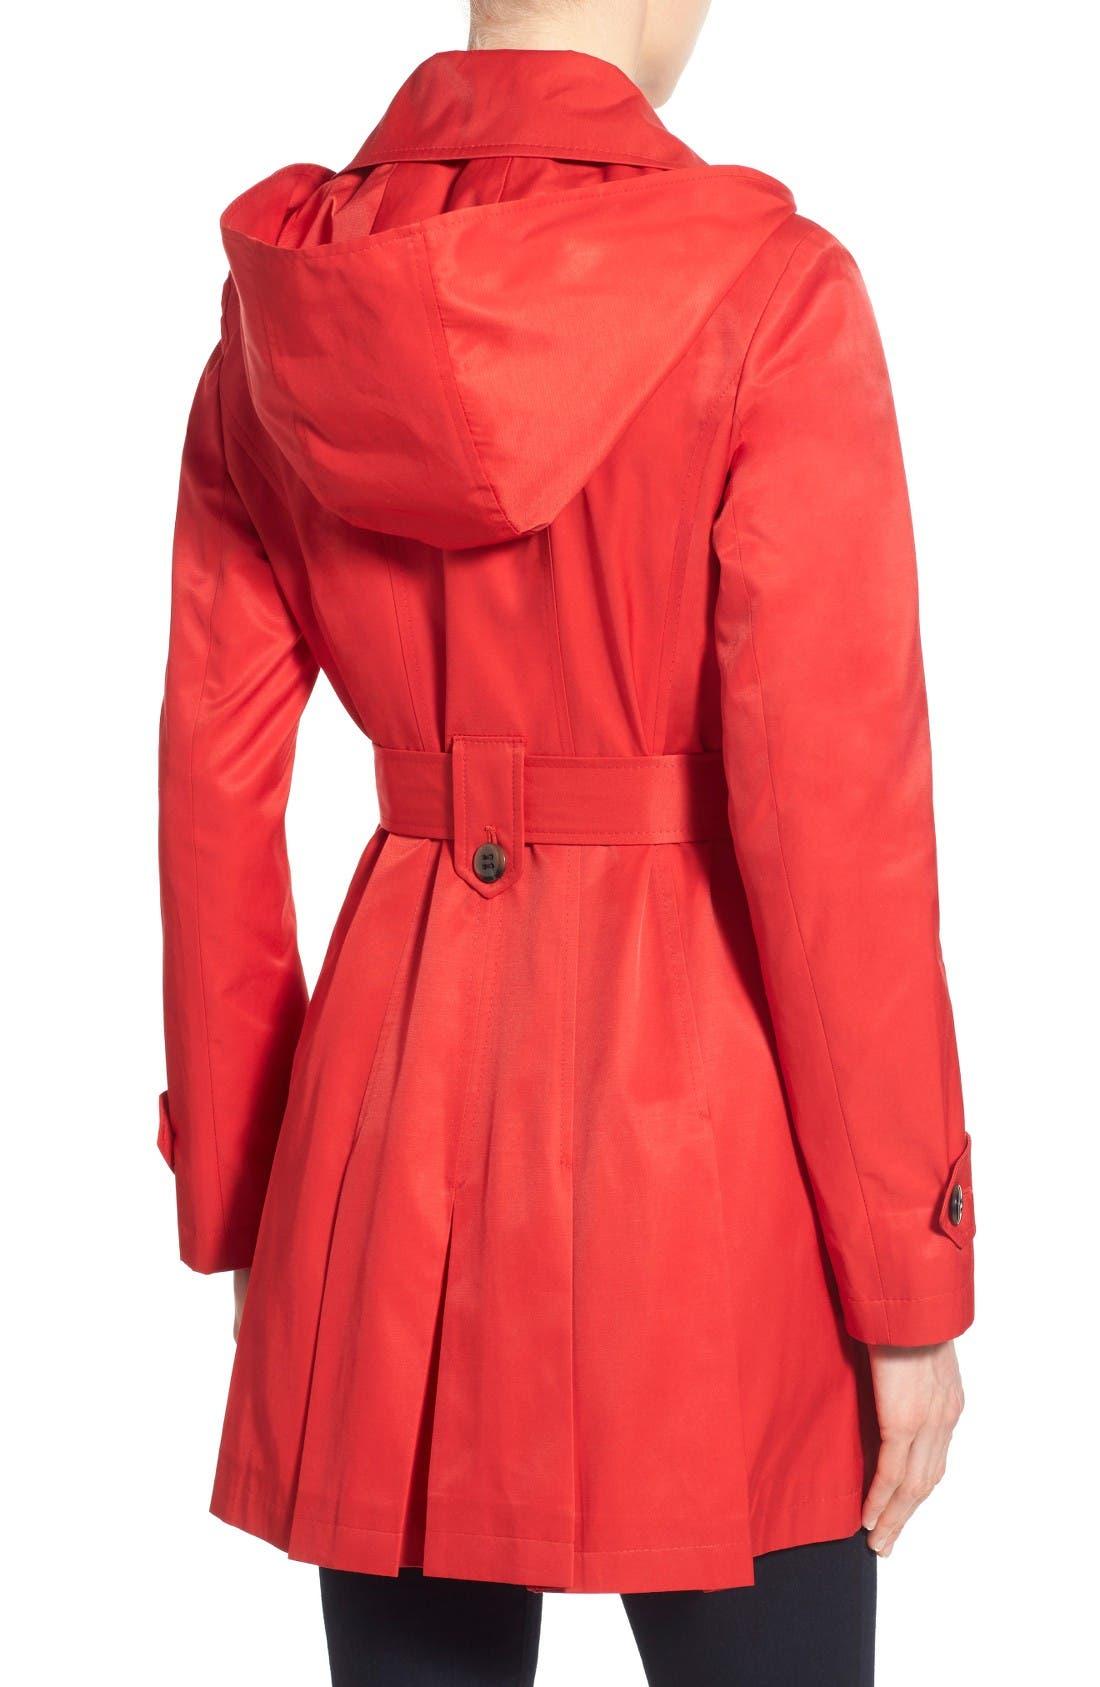 Alternate Image 3  - Via Spiga 'Scarpa' Hooded Single Breasted Trench Coat (Regular & Petite)